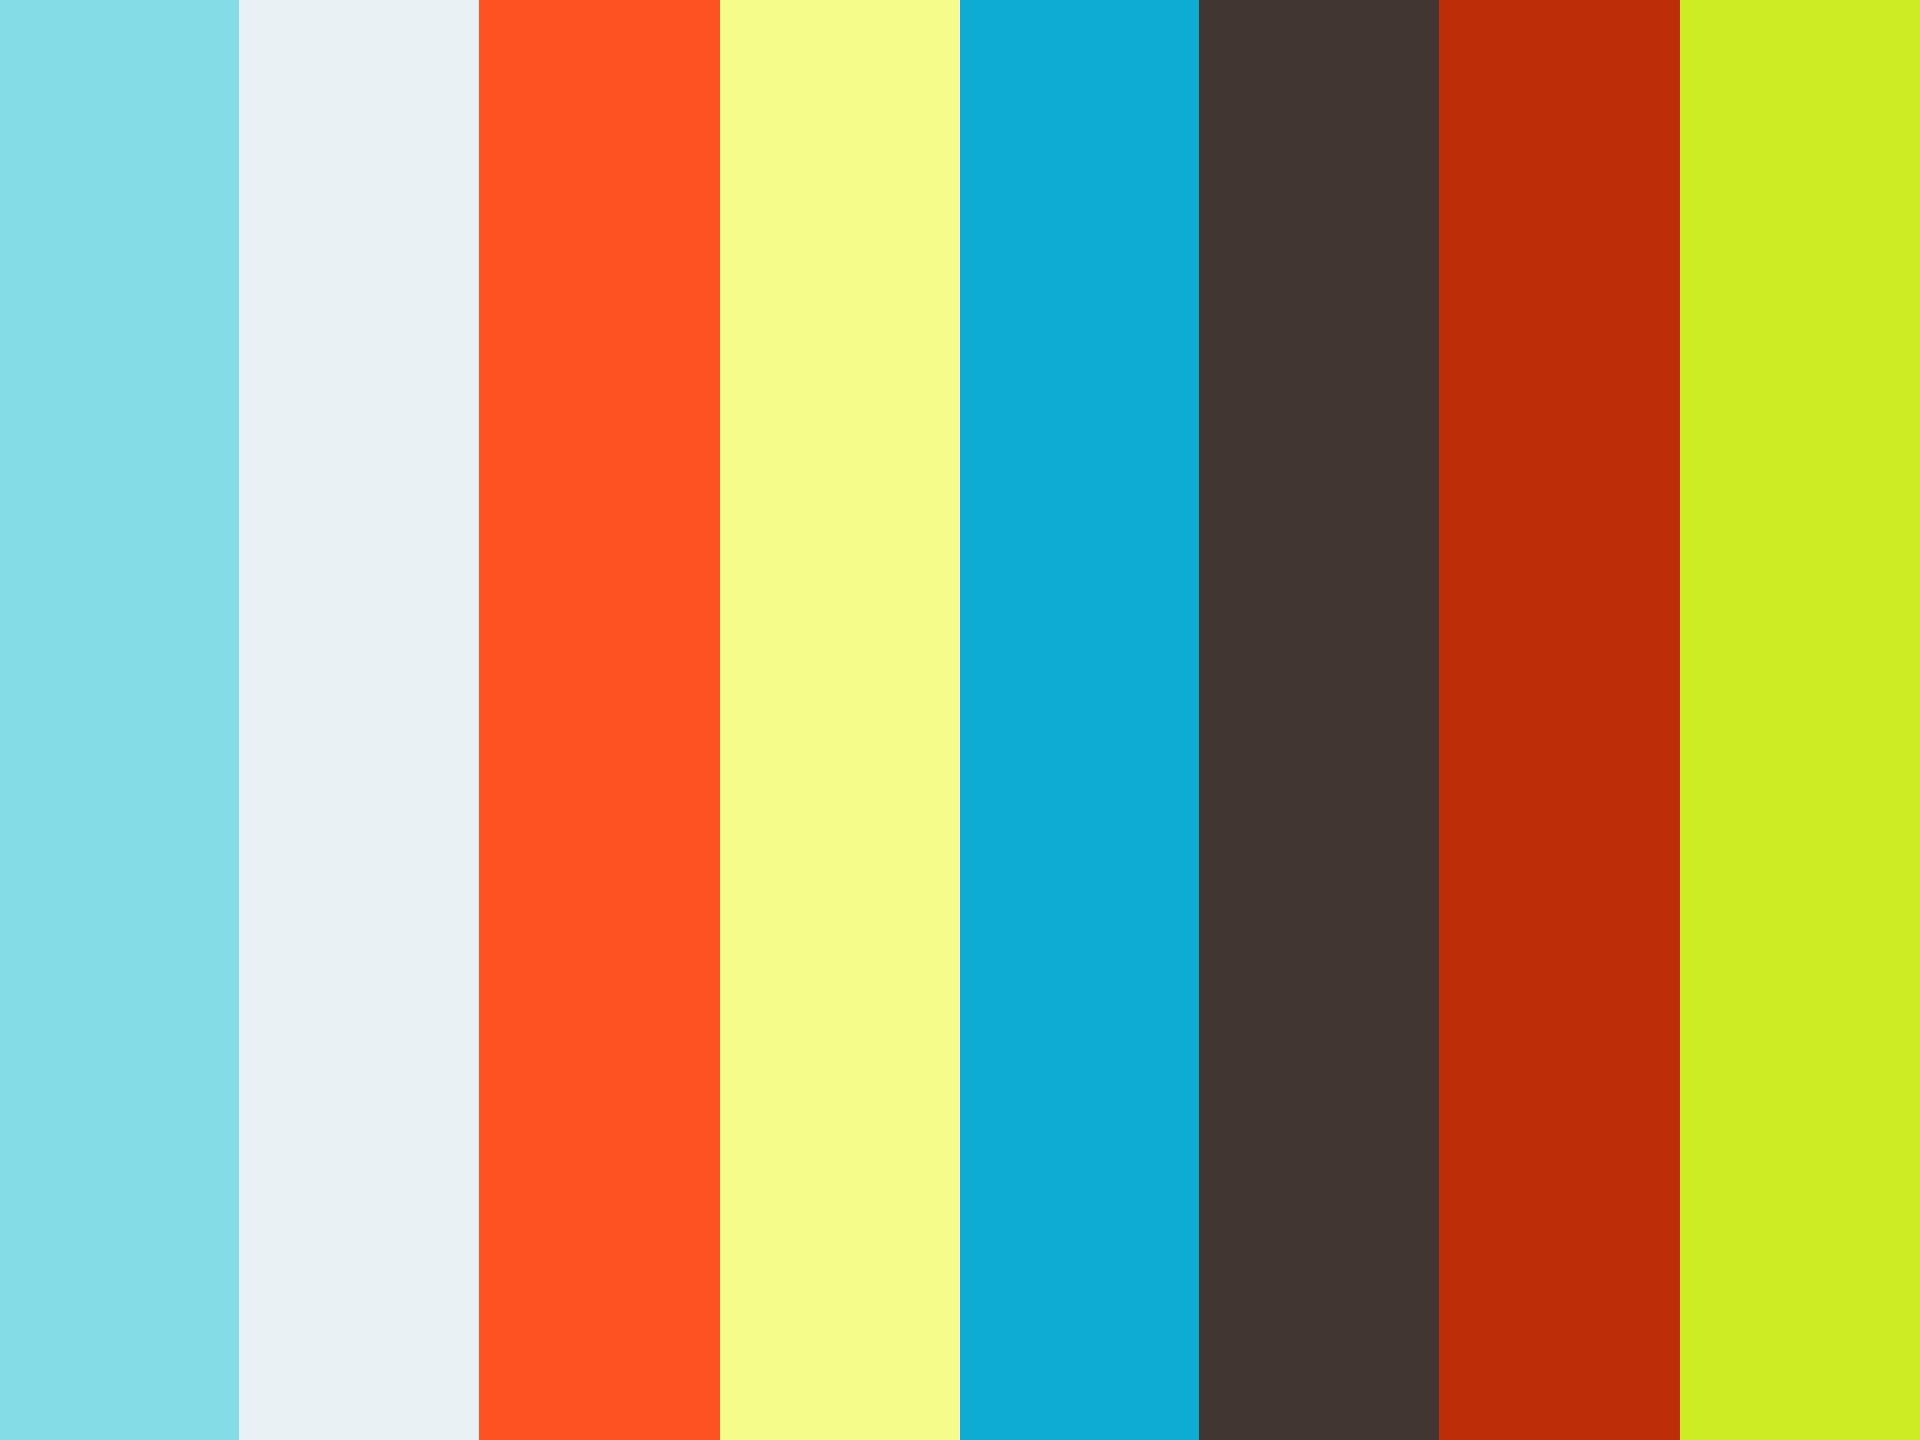 The Pixel Painter